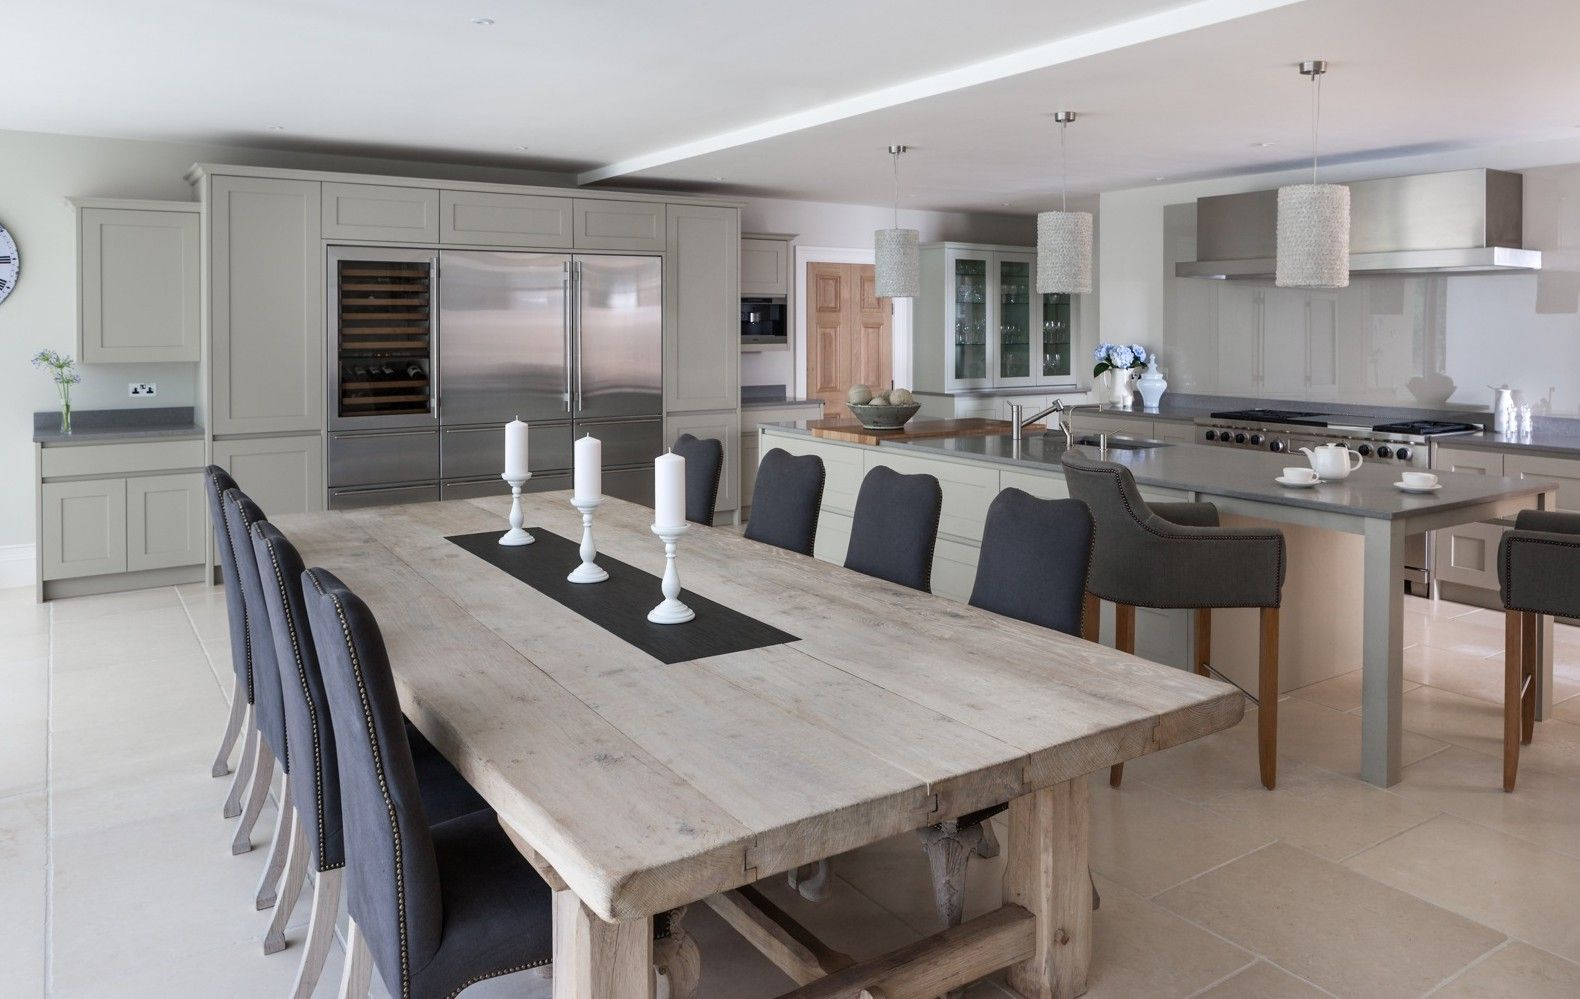 Mowlem & Co Bespoke Kitchens Luxury Furniture